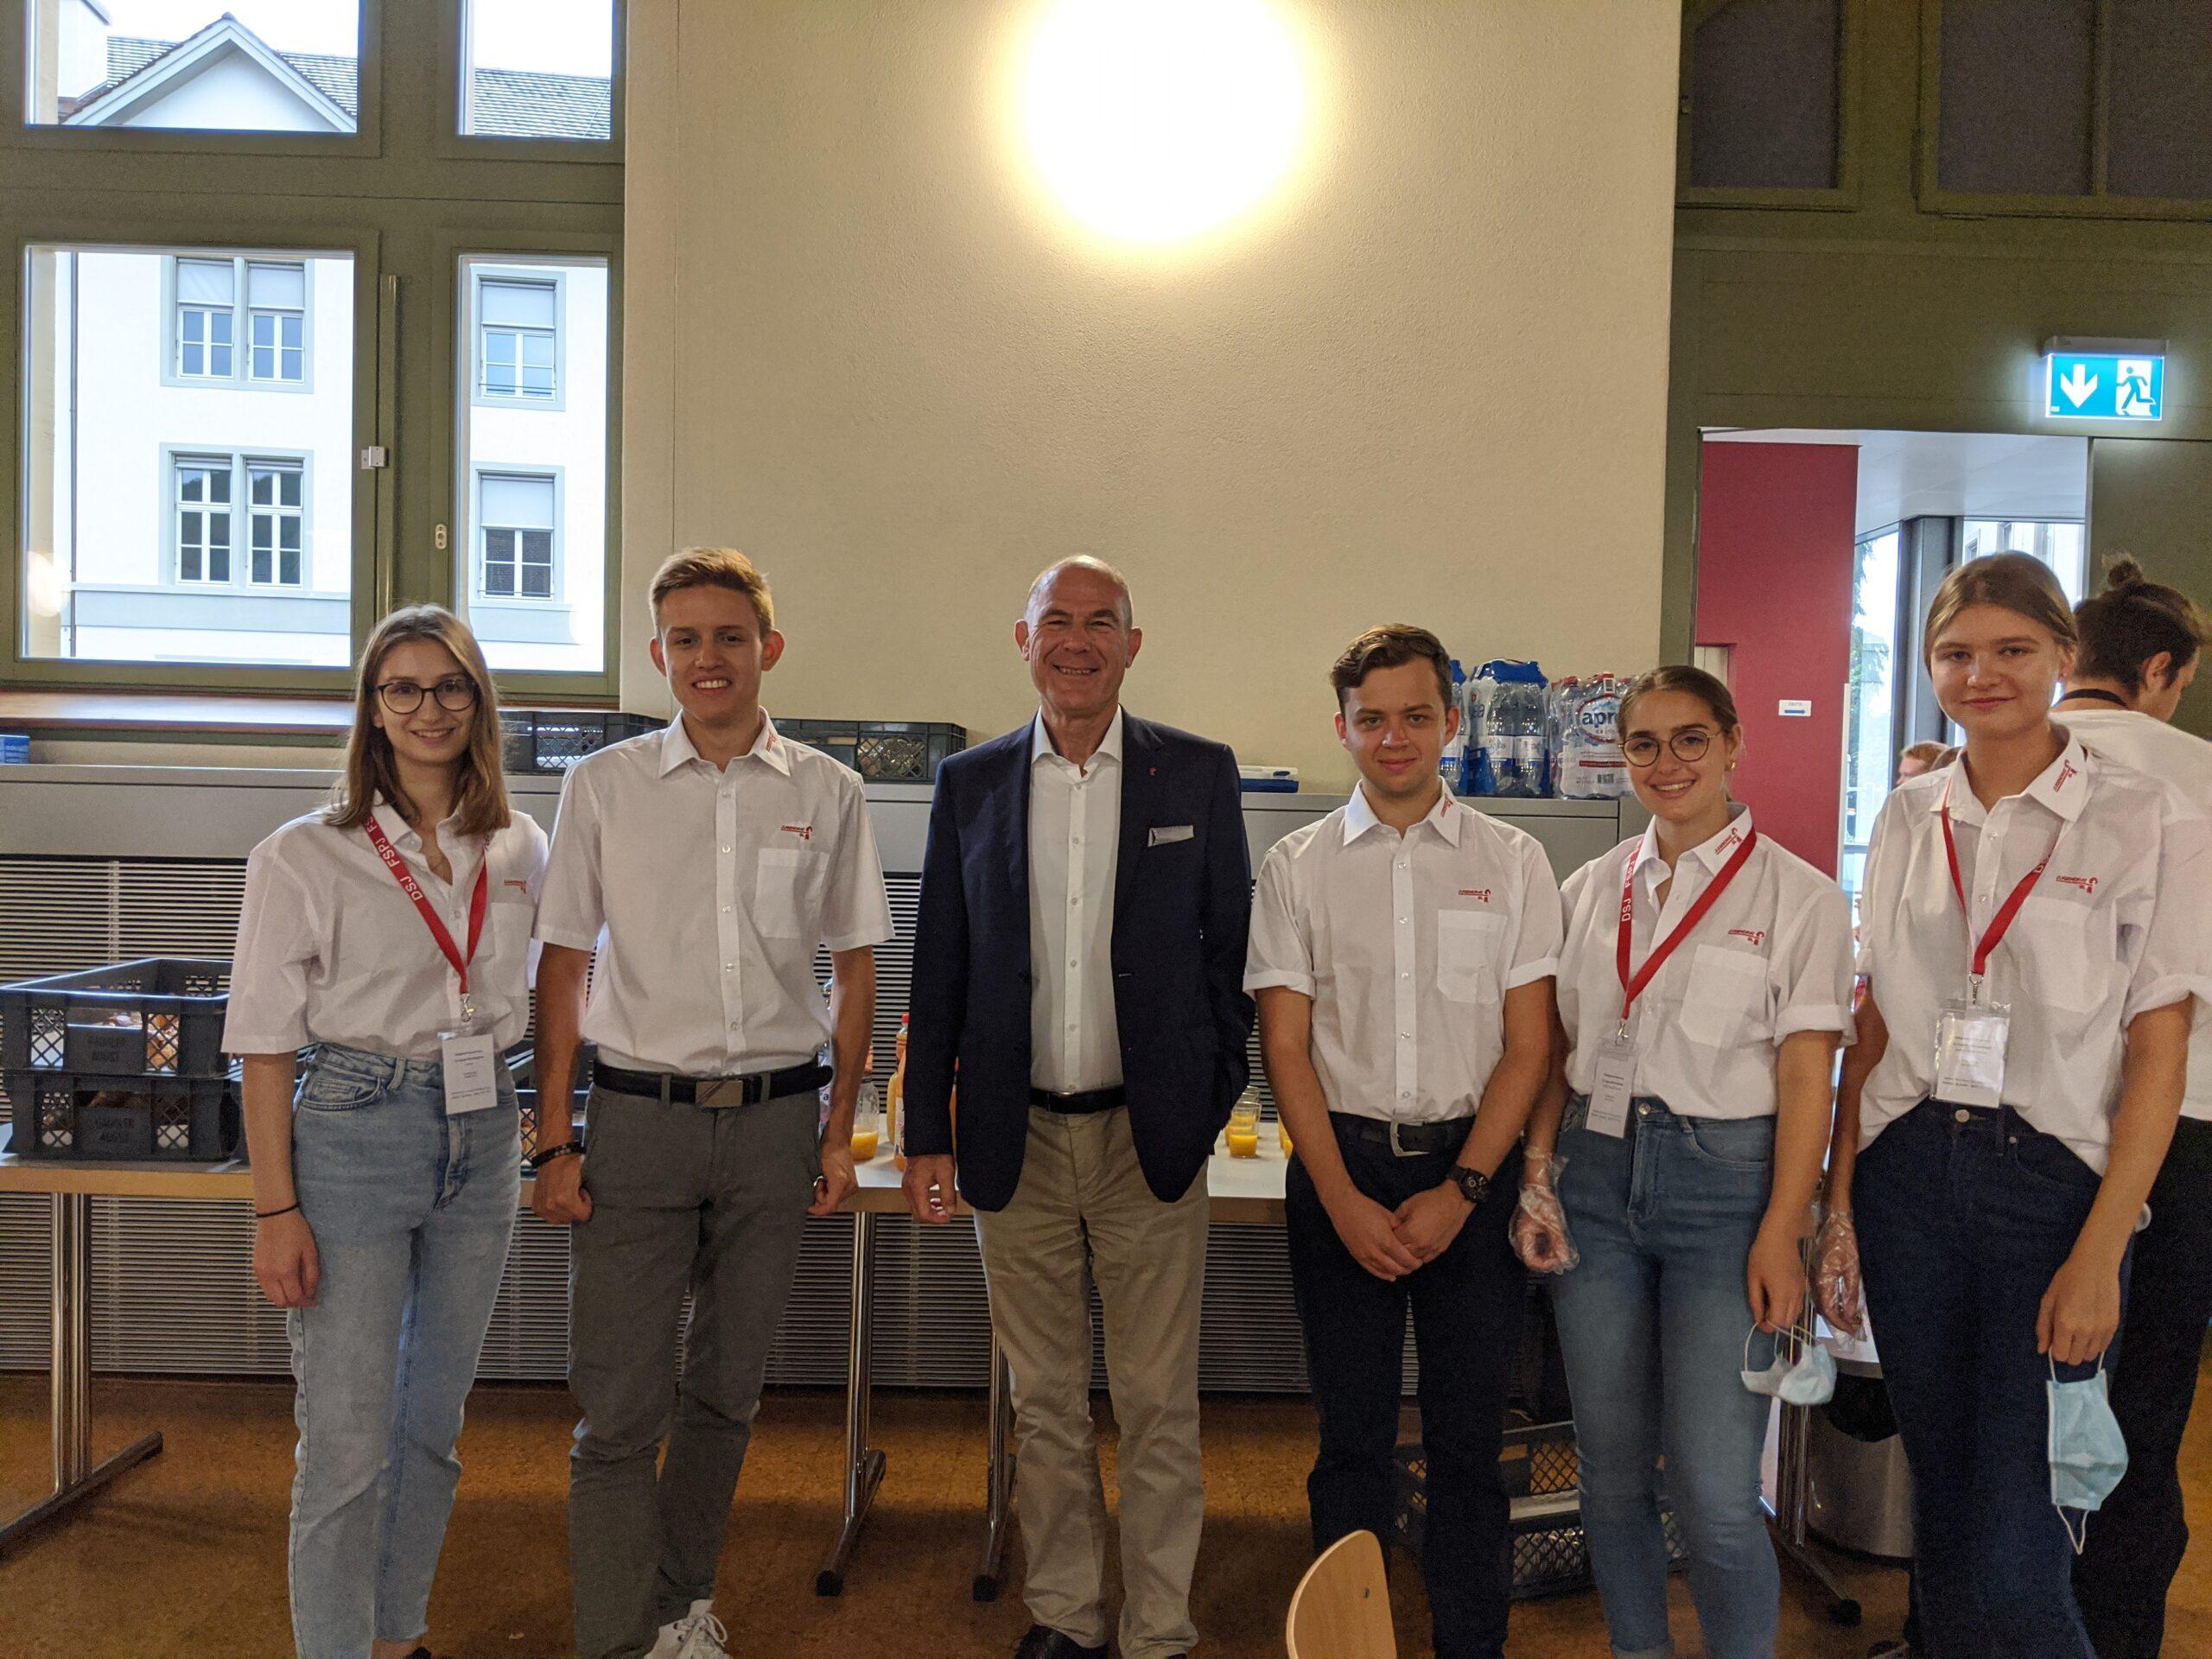 Der Jugendrat mit Anton Lauber. (Lorena Blattmann, Benjamin Rigo, Dr. Anton Lauber, Lucio Sansano, Giada Lombardi & Julia Berger)